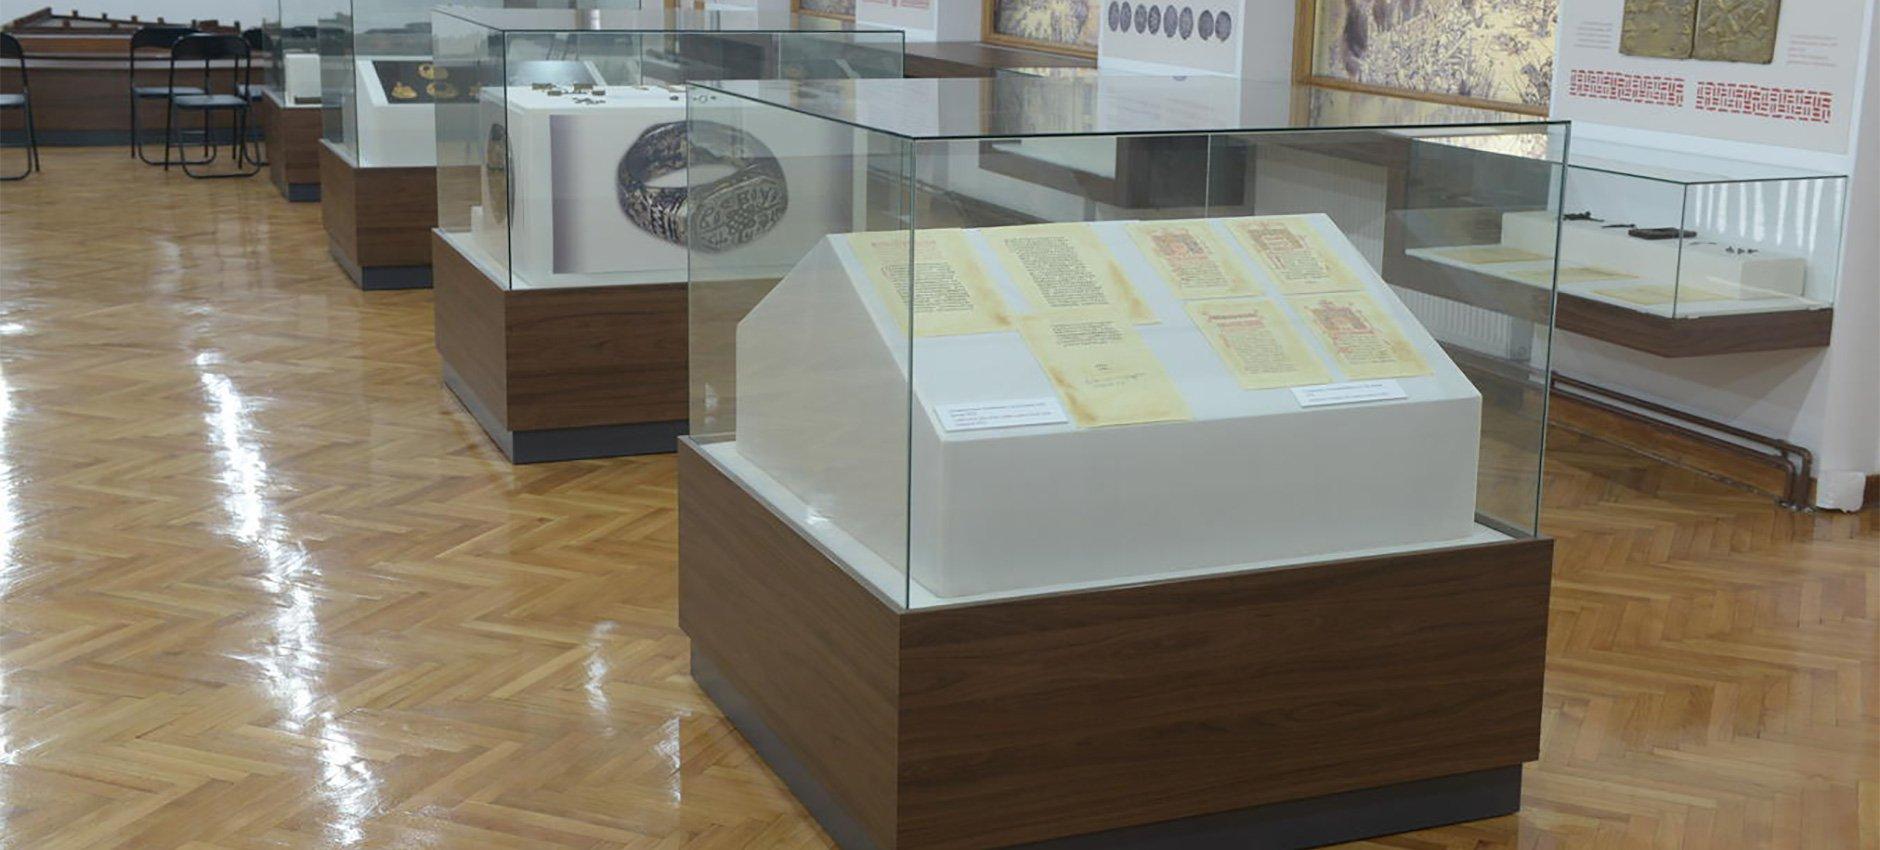 smederevo-muzej-10.jpg